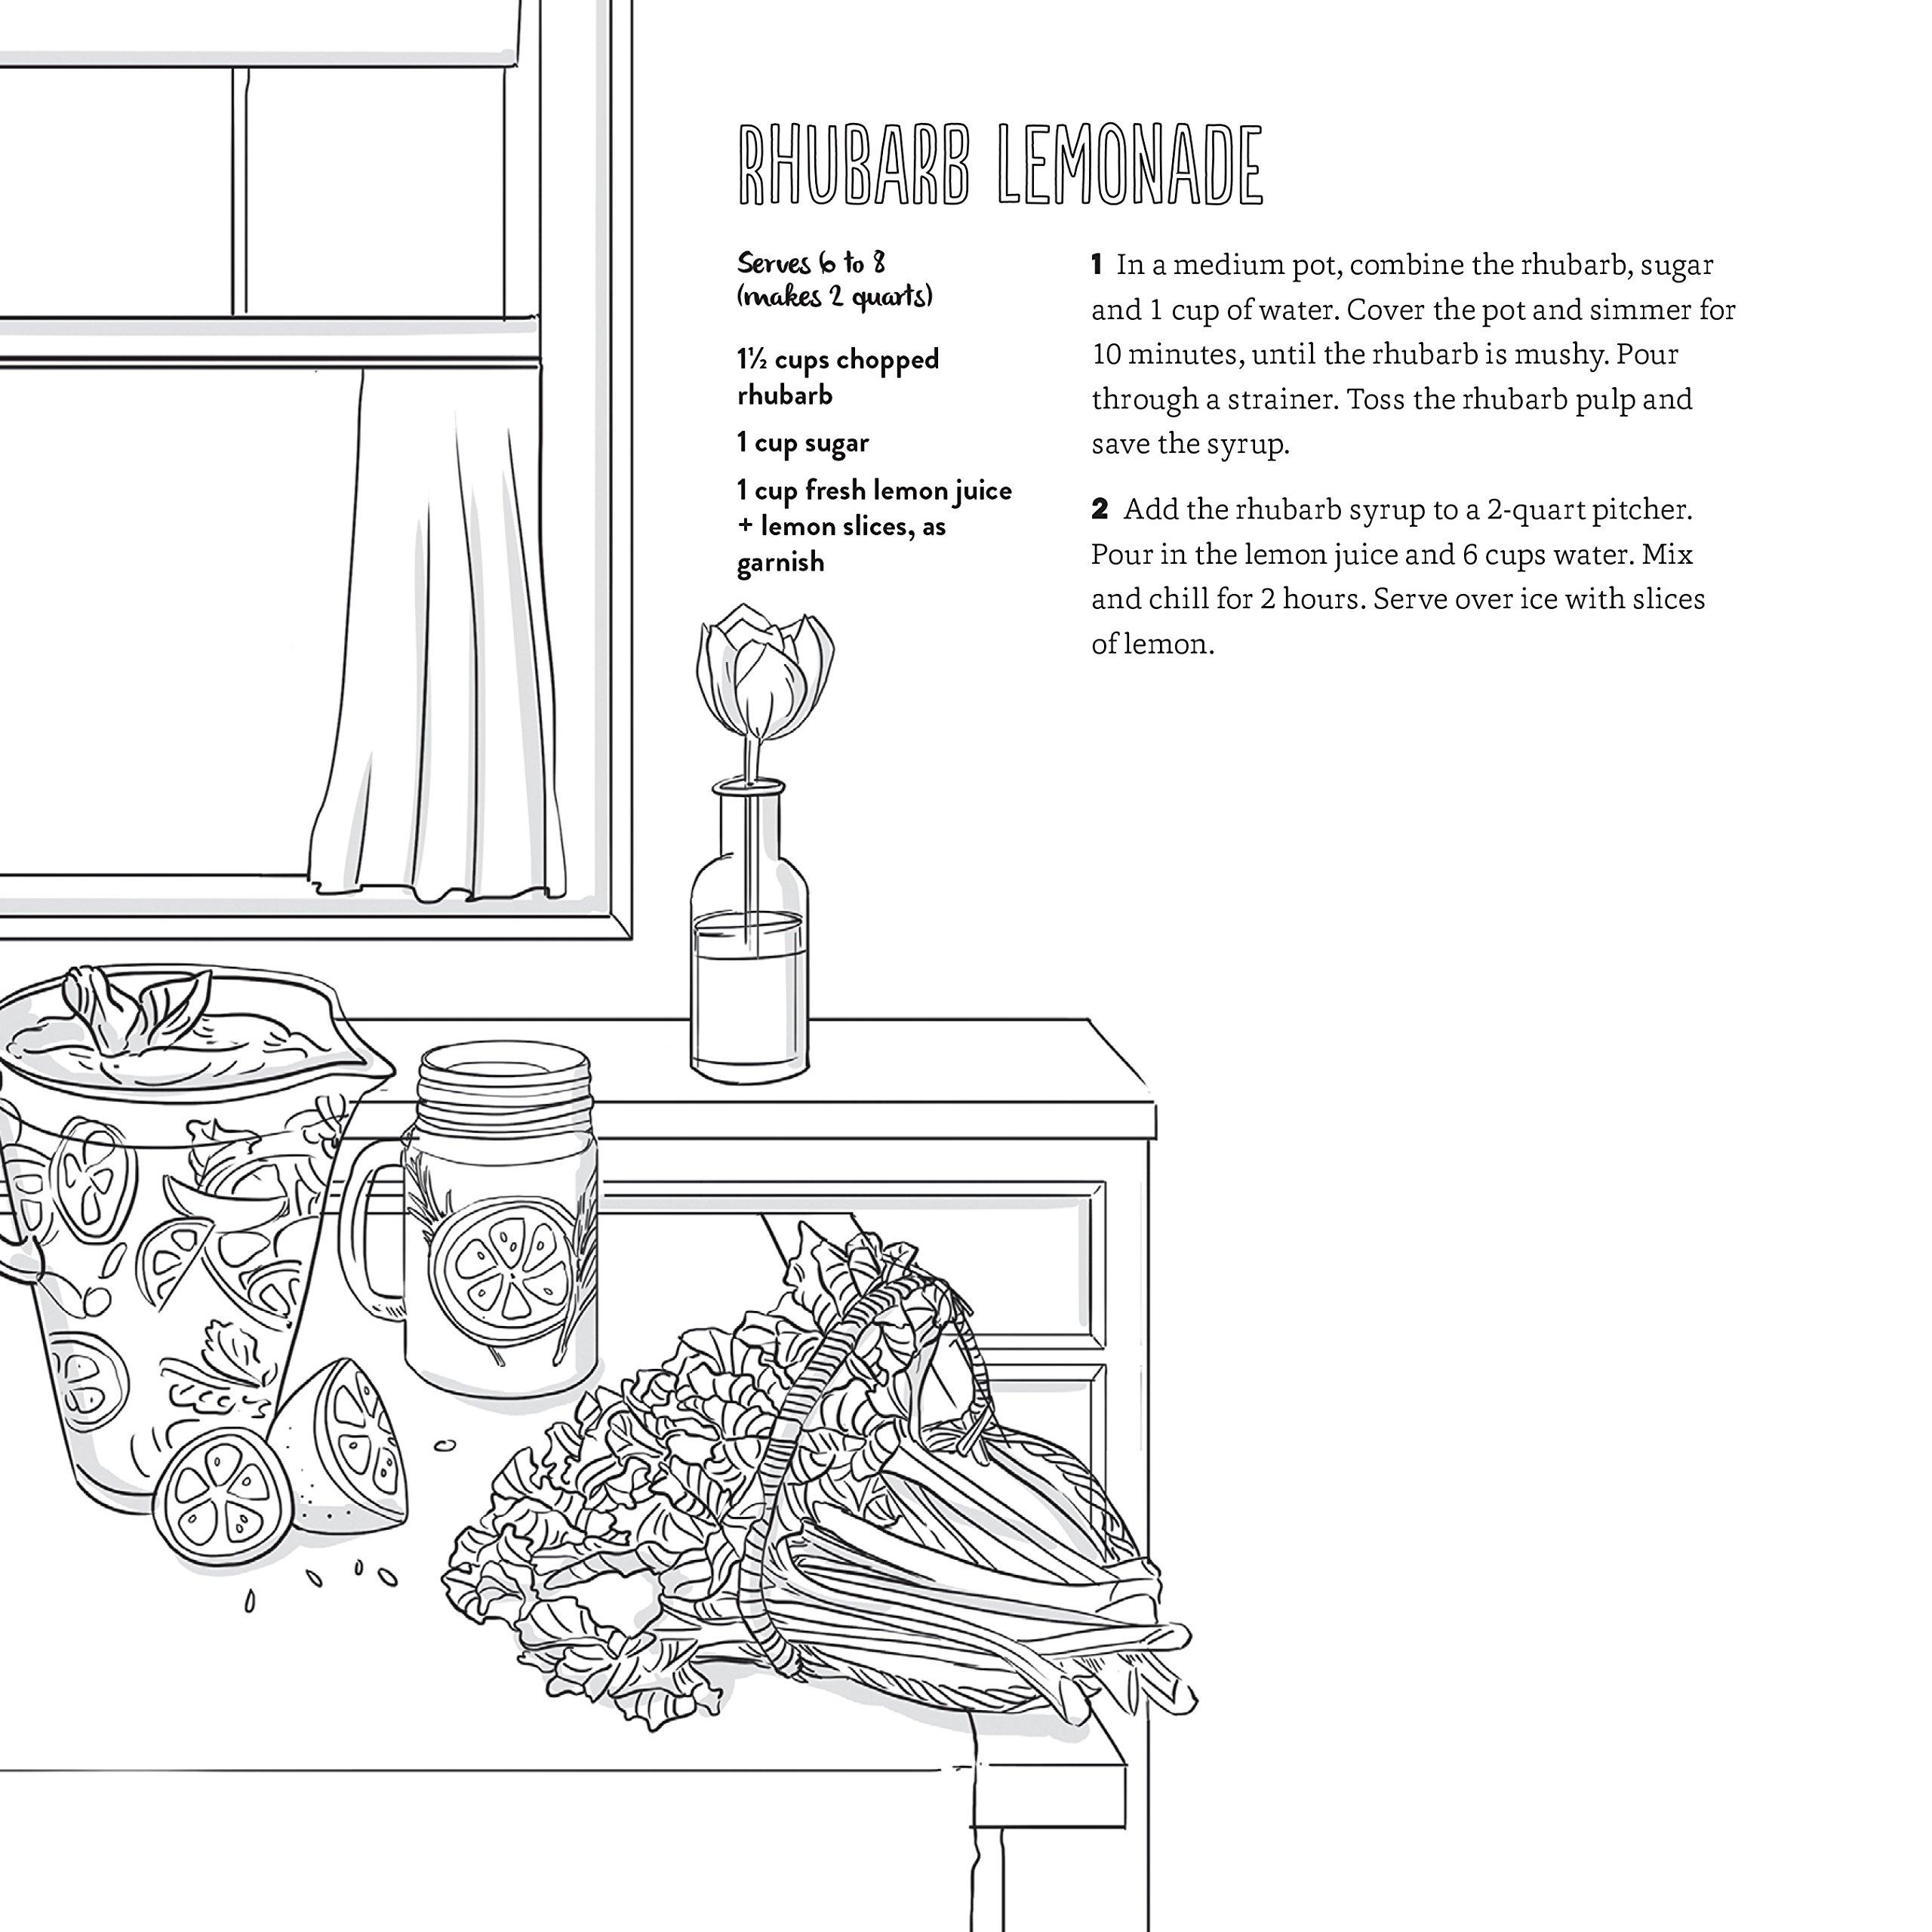 amazon com a cozy coloring cookbook 40 simple recipes to cook